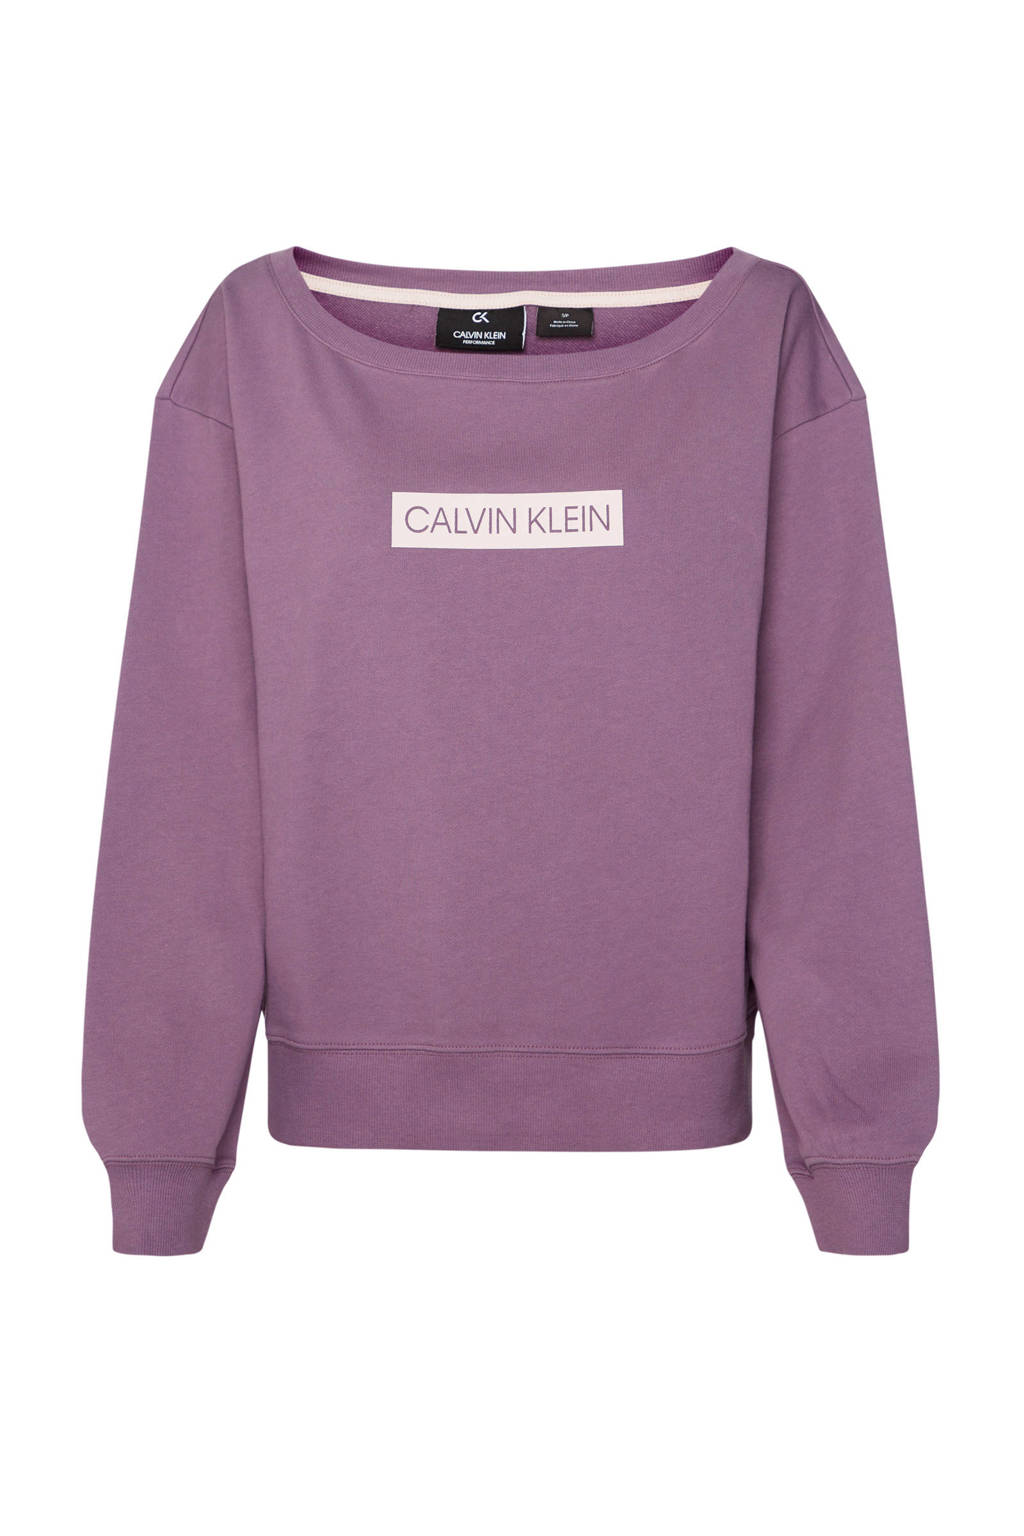 CALVIN KLEIN PERFORMANCE sportsweater paars, Paars